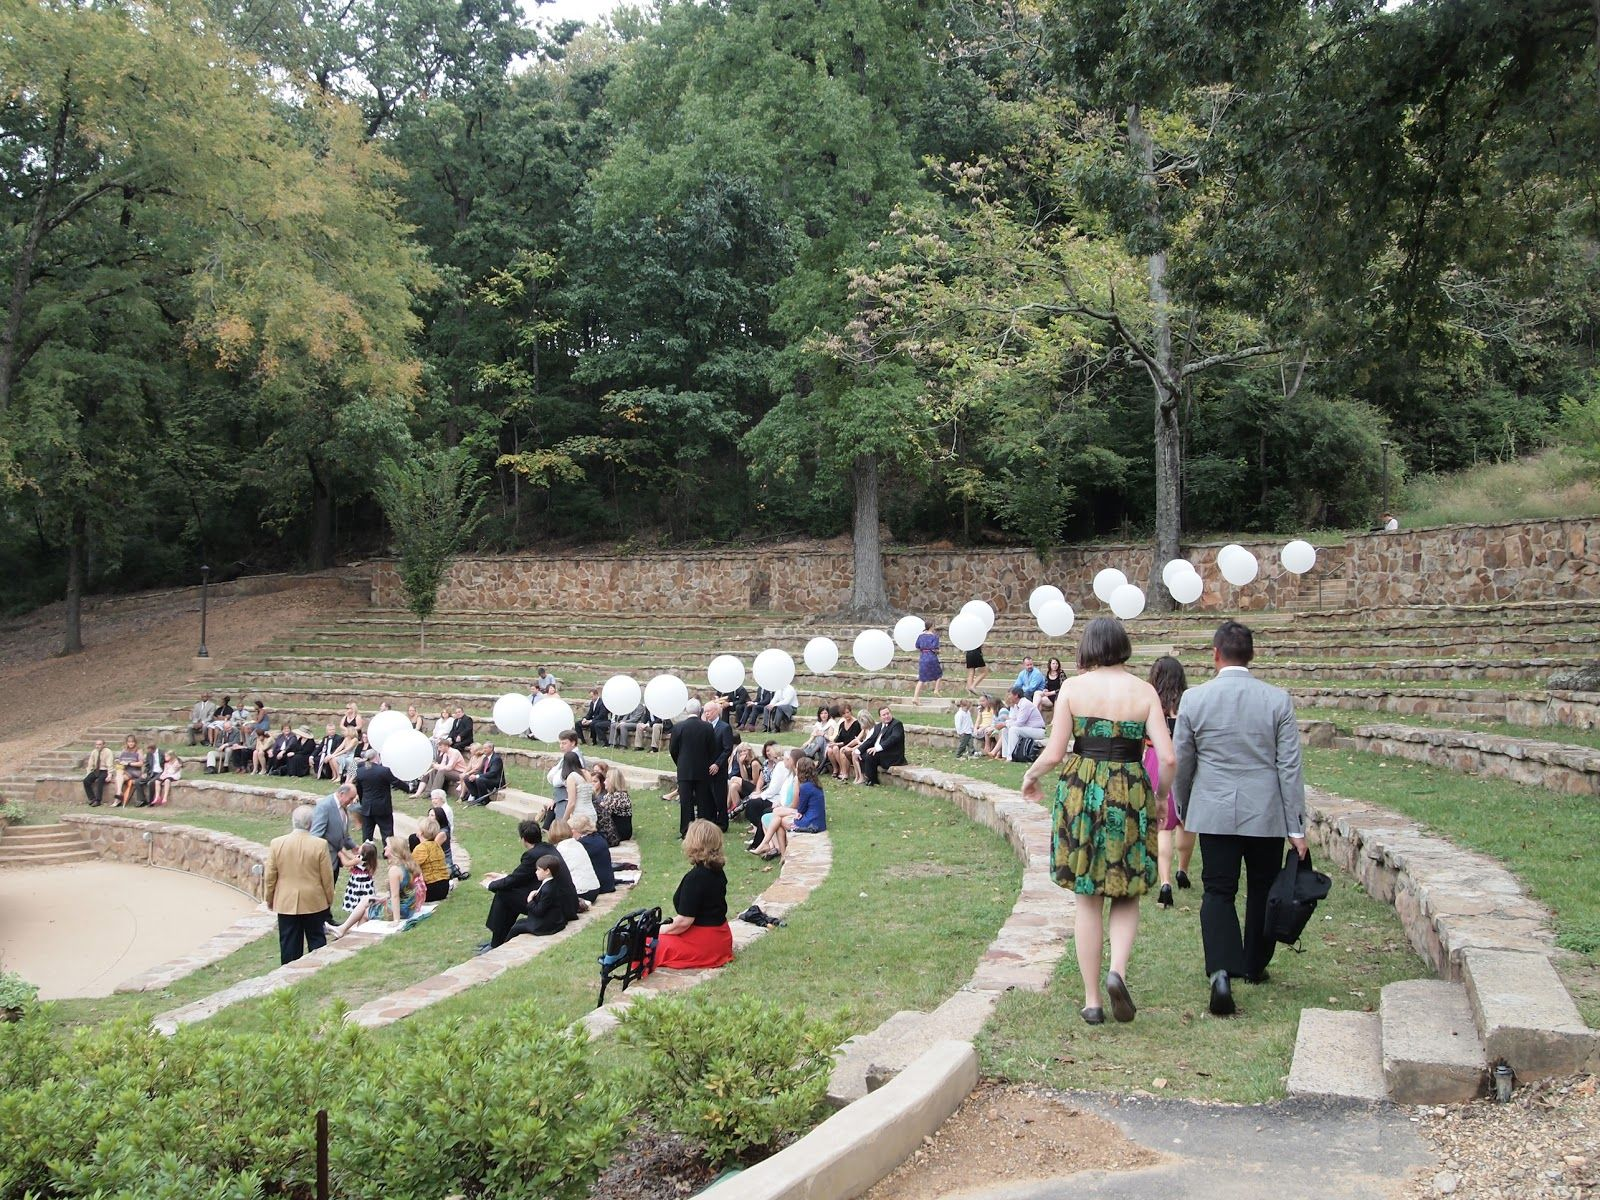 Ampitheater Wedding At Avondale Park Birmingham Google Search